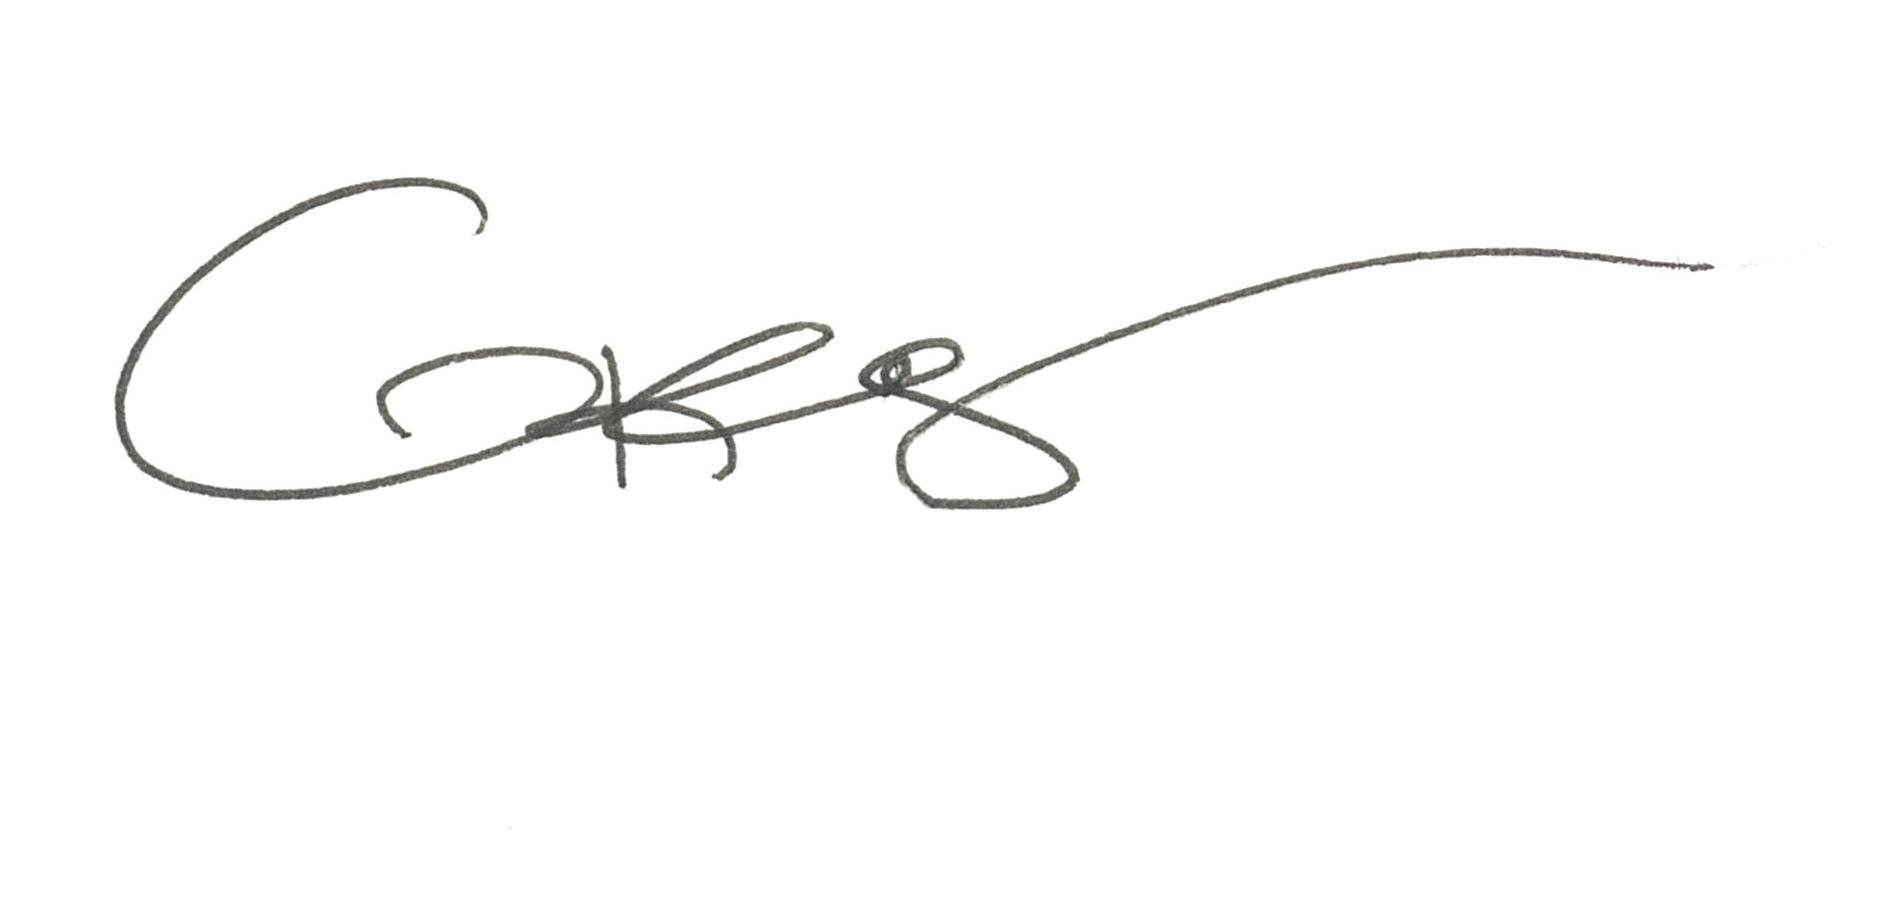 Greg' Signature.jpg